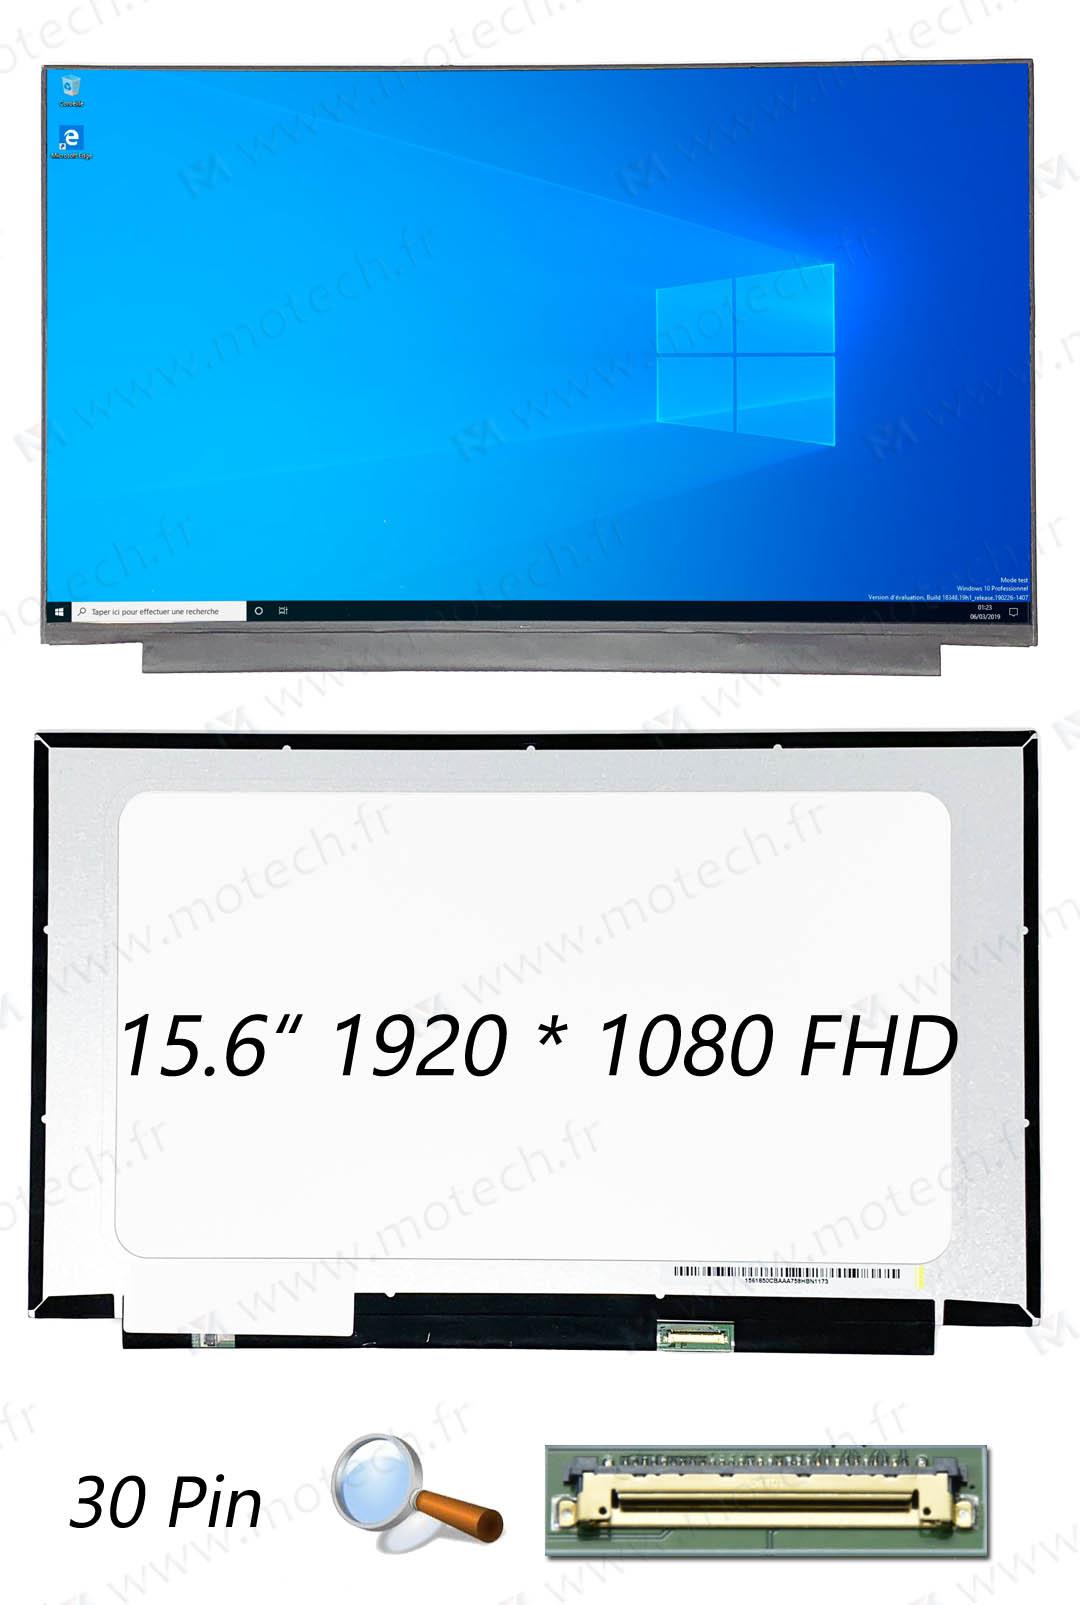 DERE Winodows R9 PRO screen, DERE Winodows R9 PRO display, DERE Winodows R9 PRO LCD, DERE Winodows R9 PRO LCD Display,